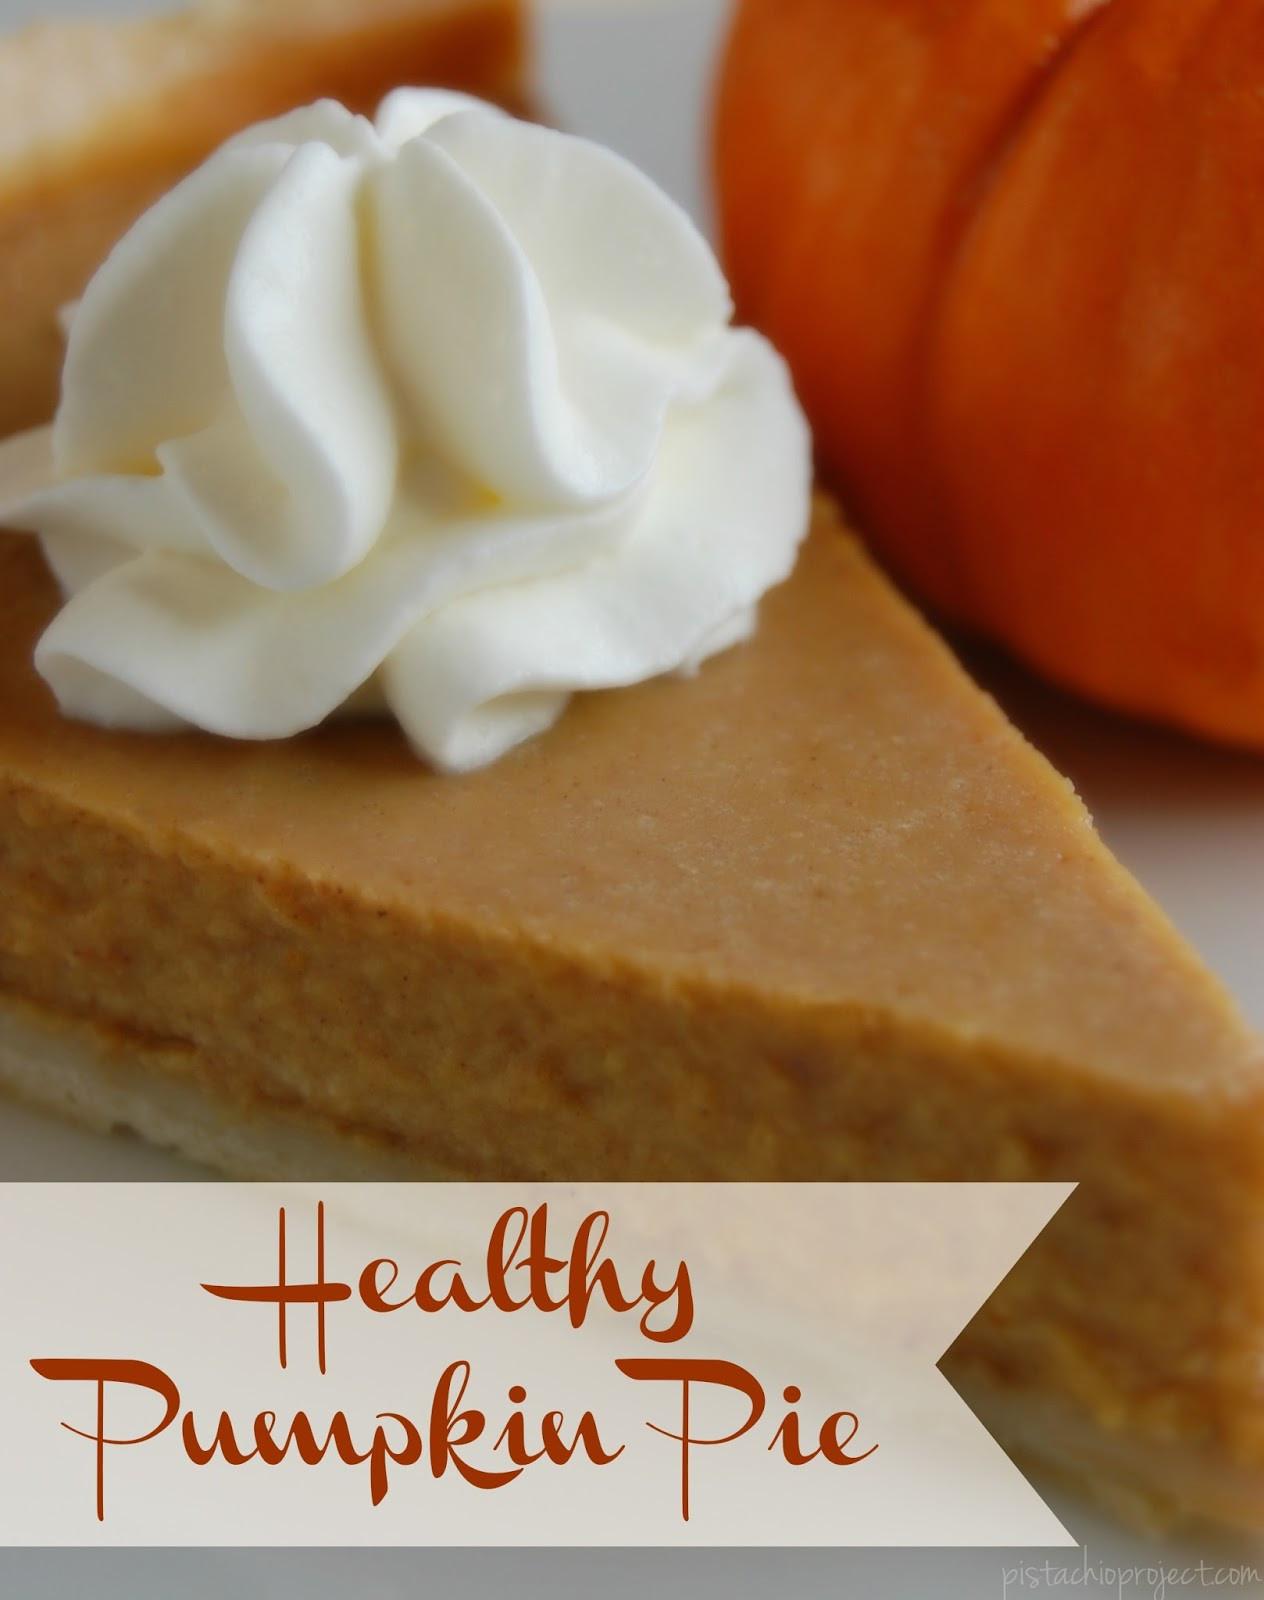 Healthy Pumpkin Pie  Healthy Pumpkin Pie The Pistachio Project